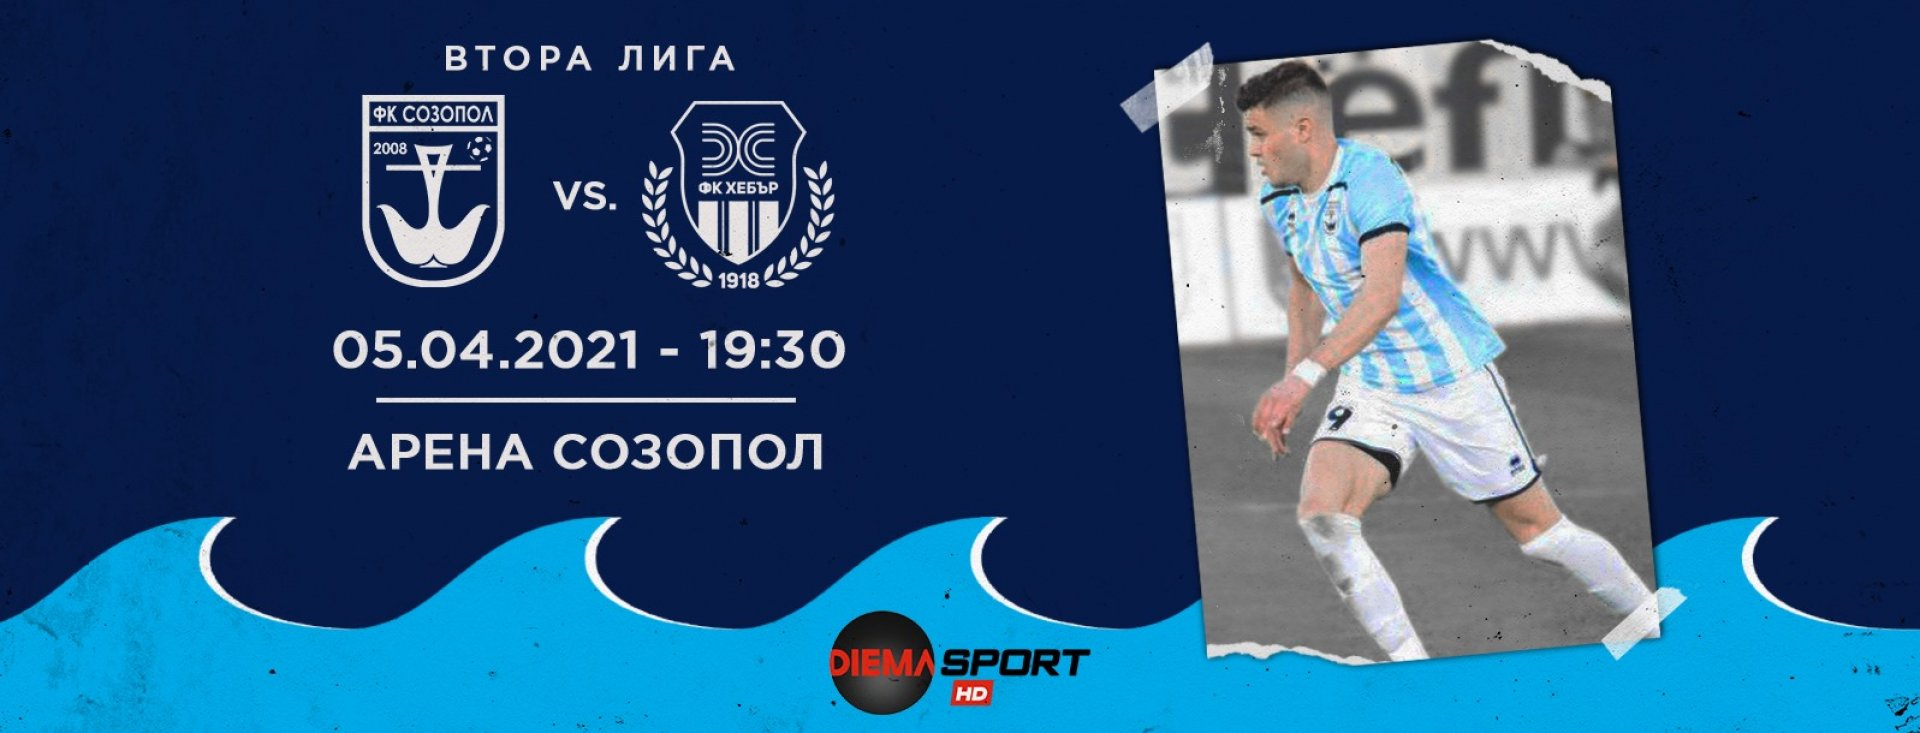 Домакинската среща ще се играе на стадиона на Созопол